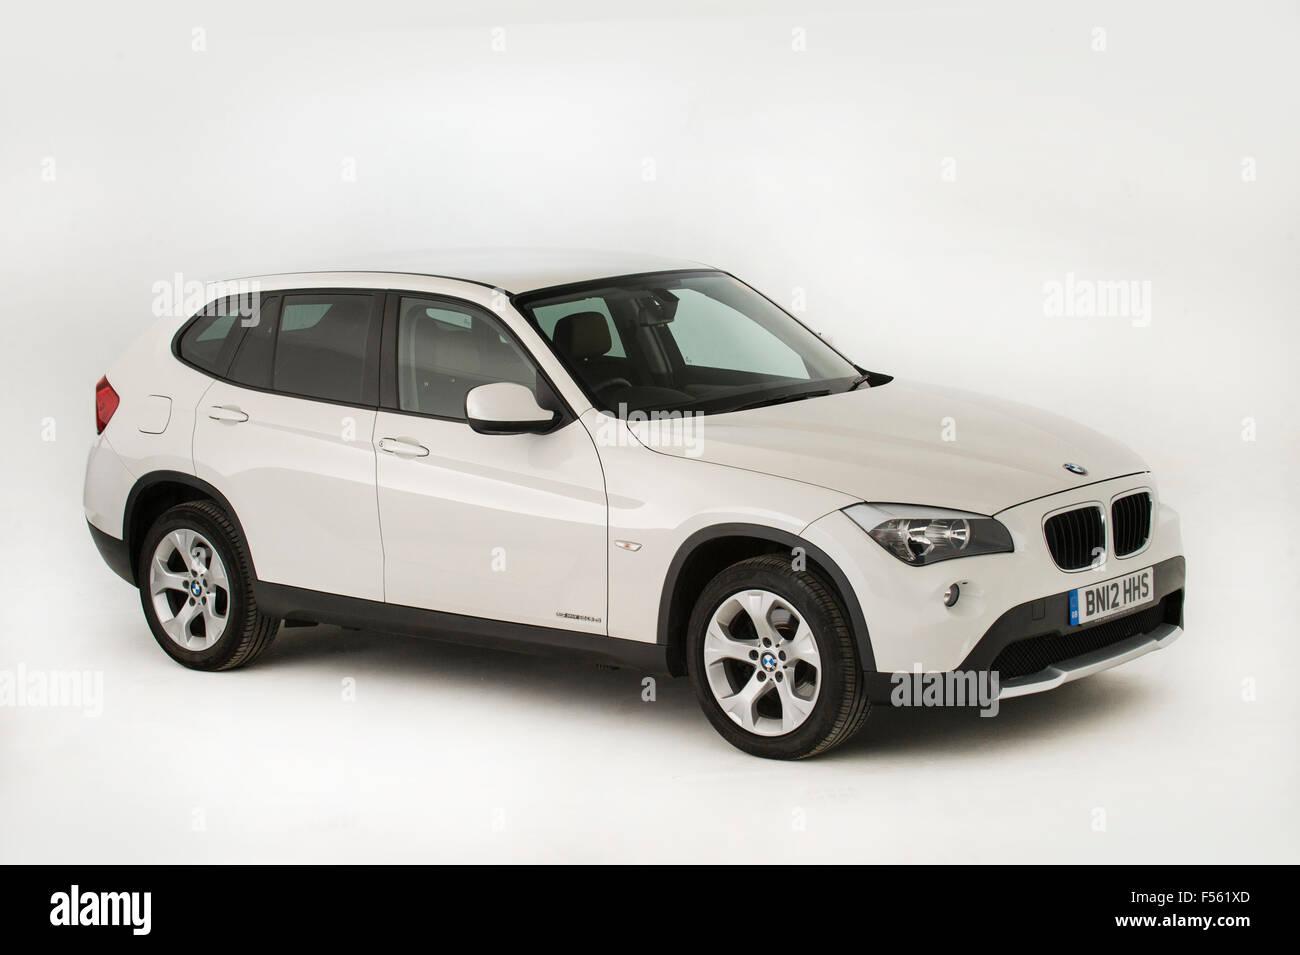 2012 BMW X1 - Stock Image